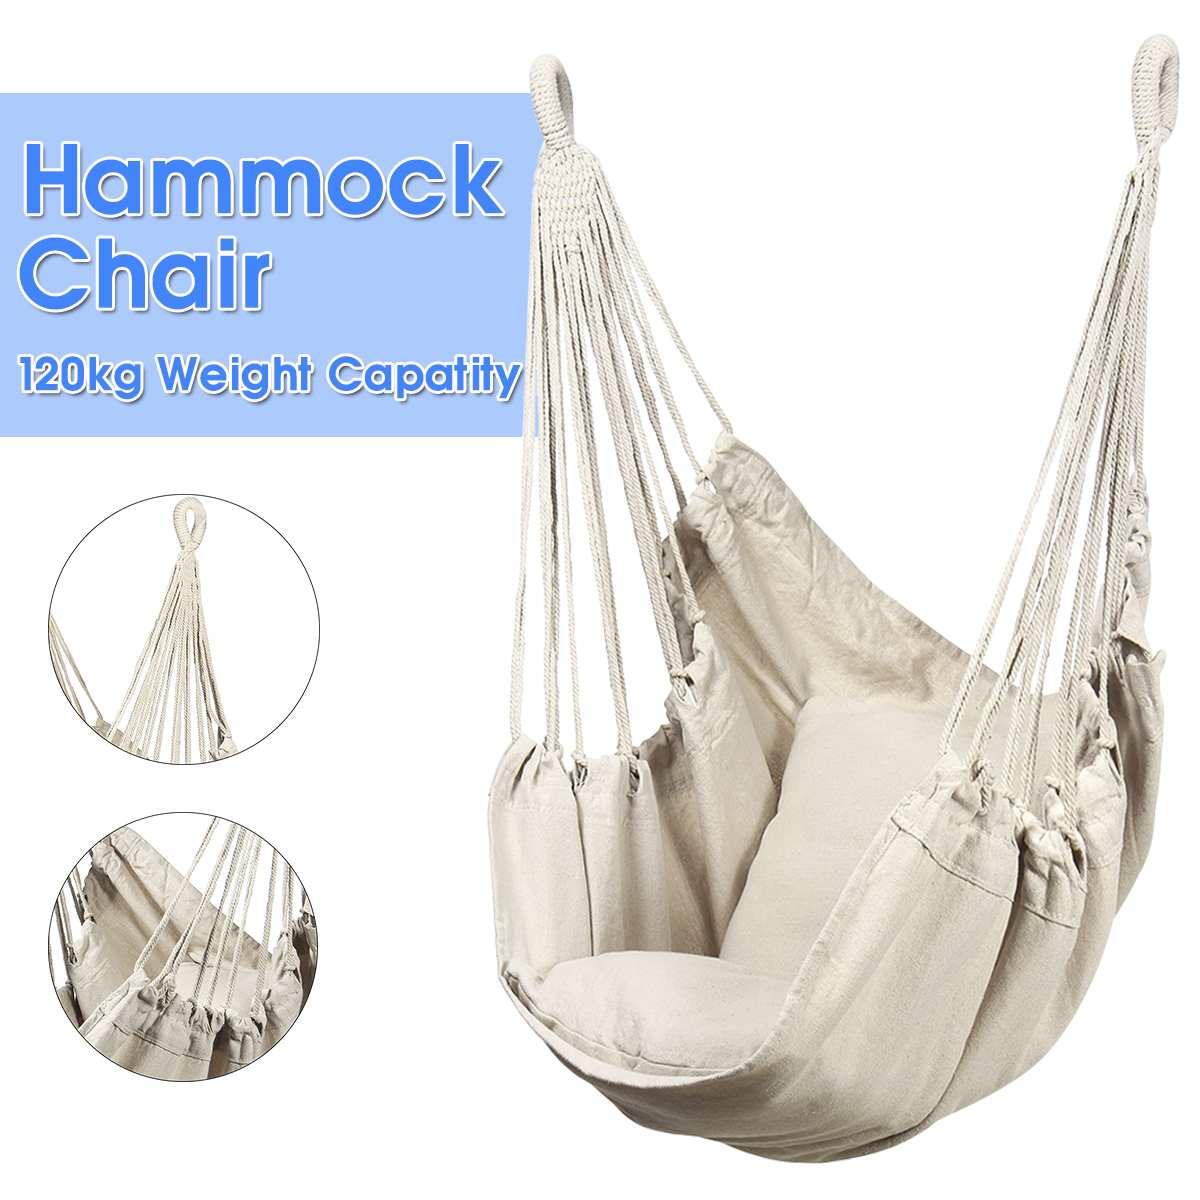 Instyle Swing Seat Hammock Chair Swing Chair Patio Swing Outdoor Garden Hanging Chair Travel Camping Hammock Silla Colgante